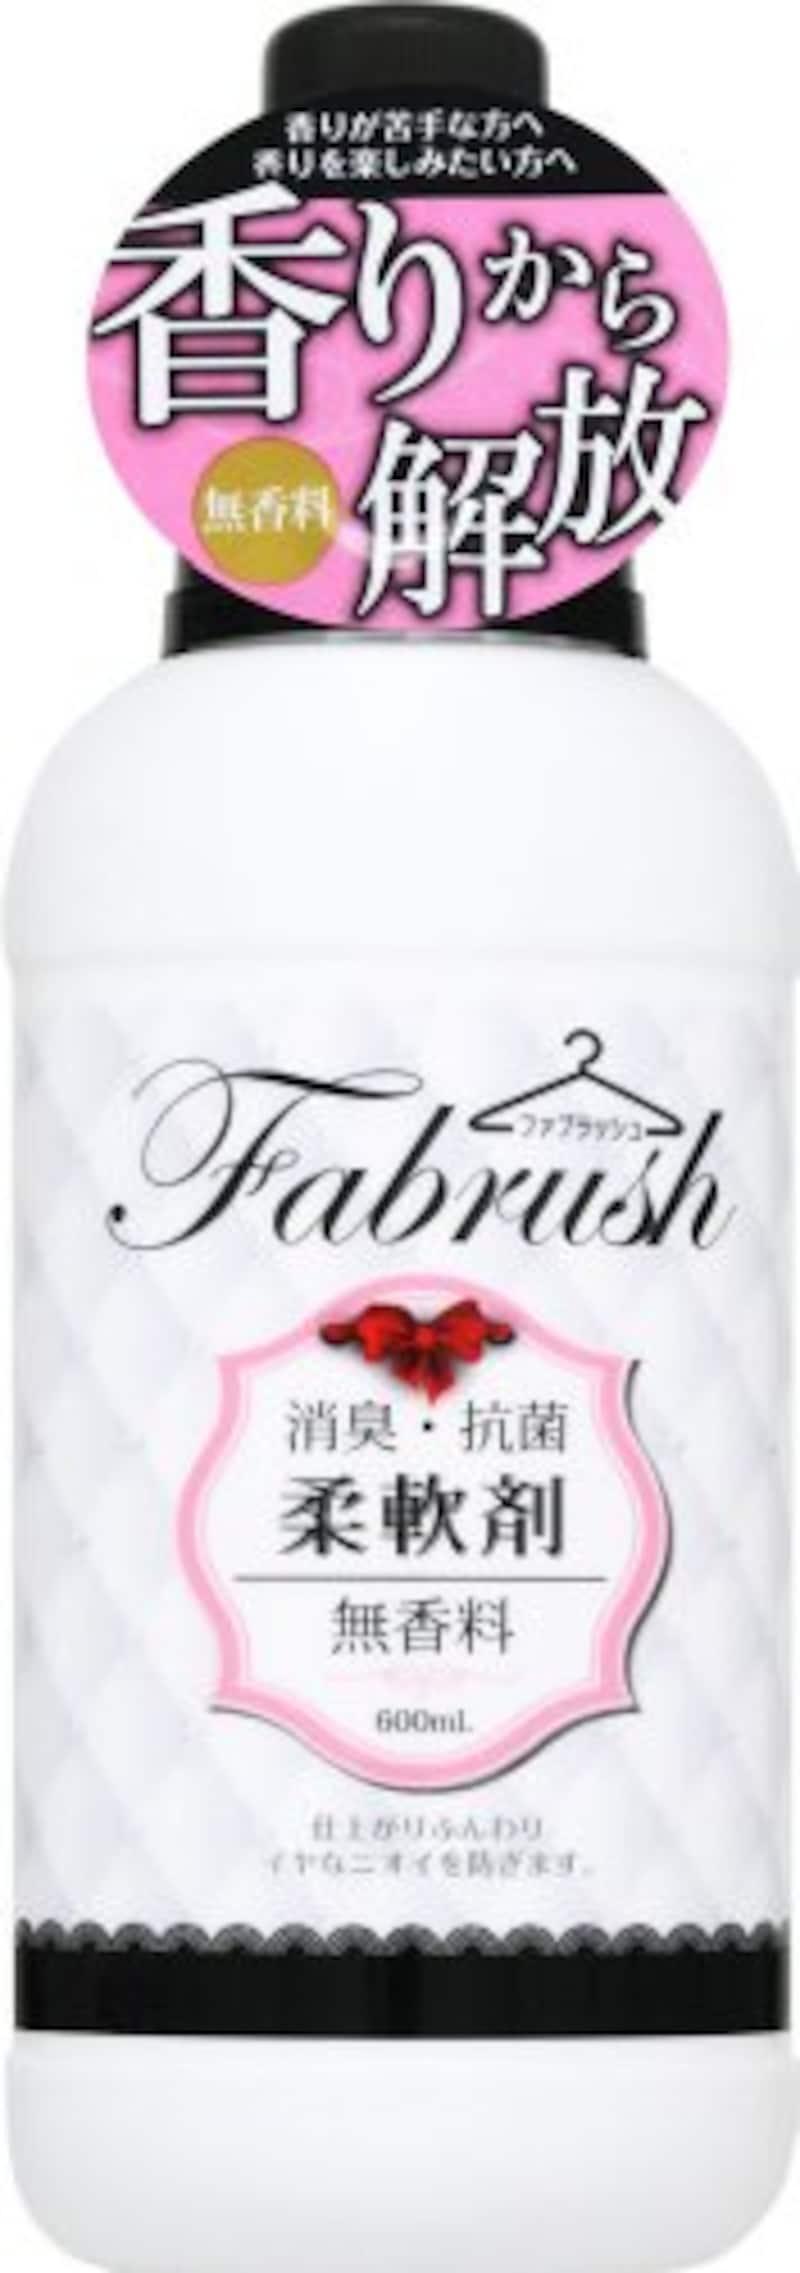 fabrush 柔軟剤 無香料 600ml